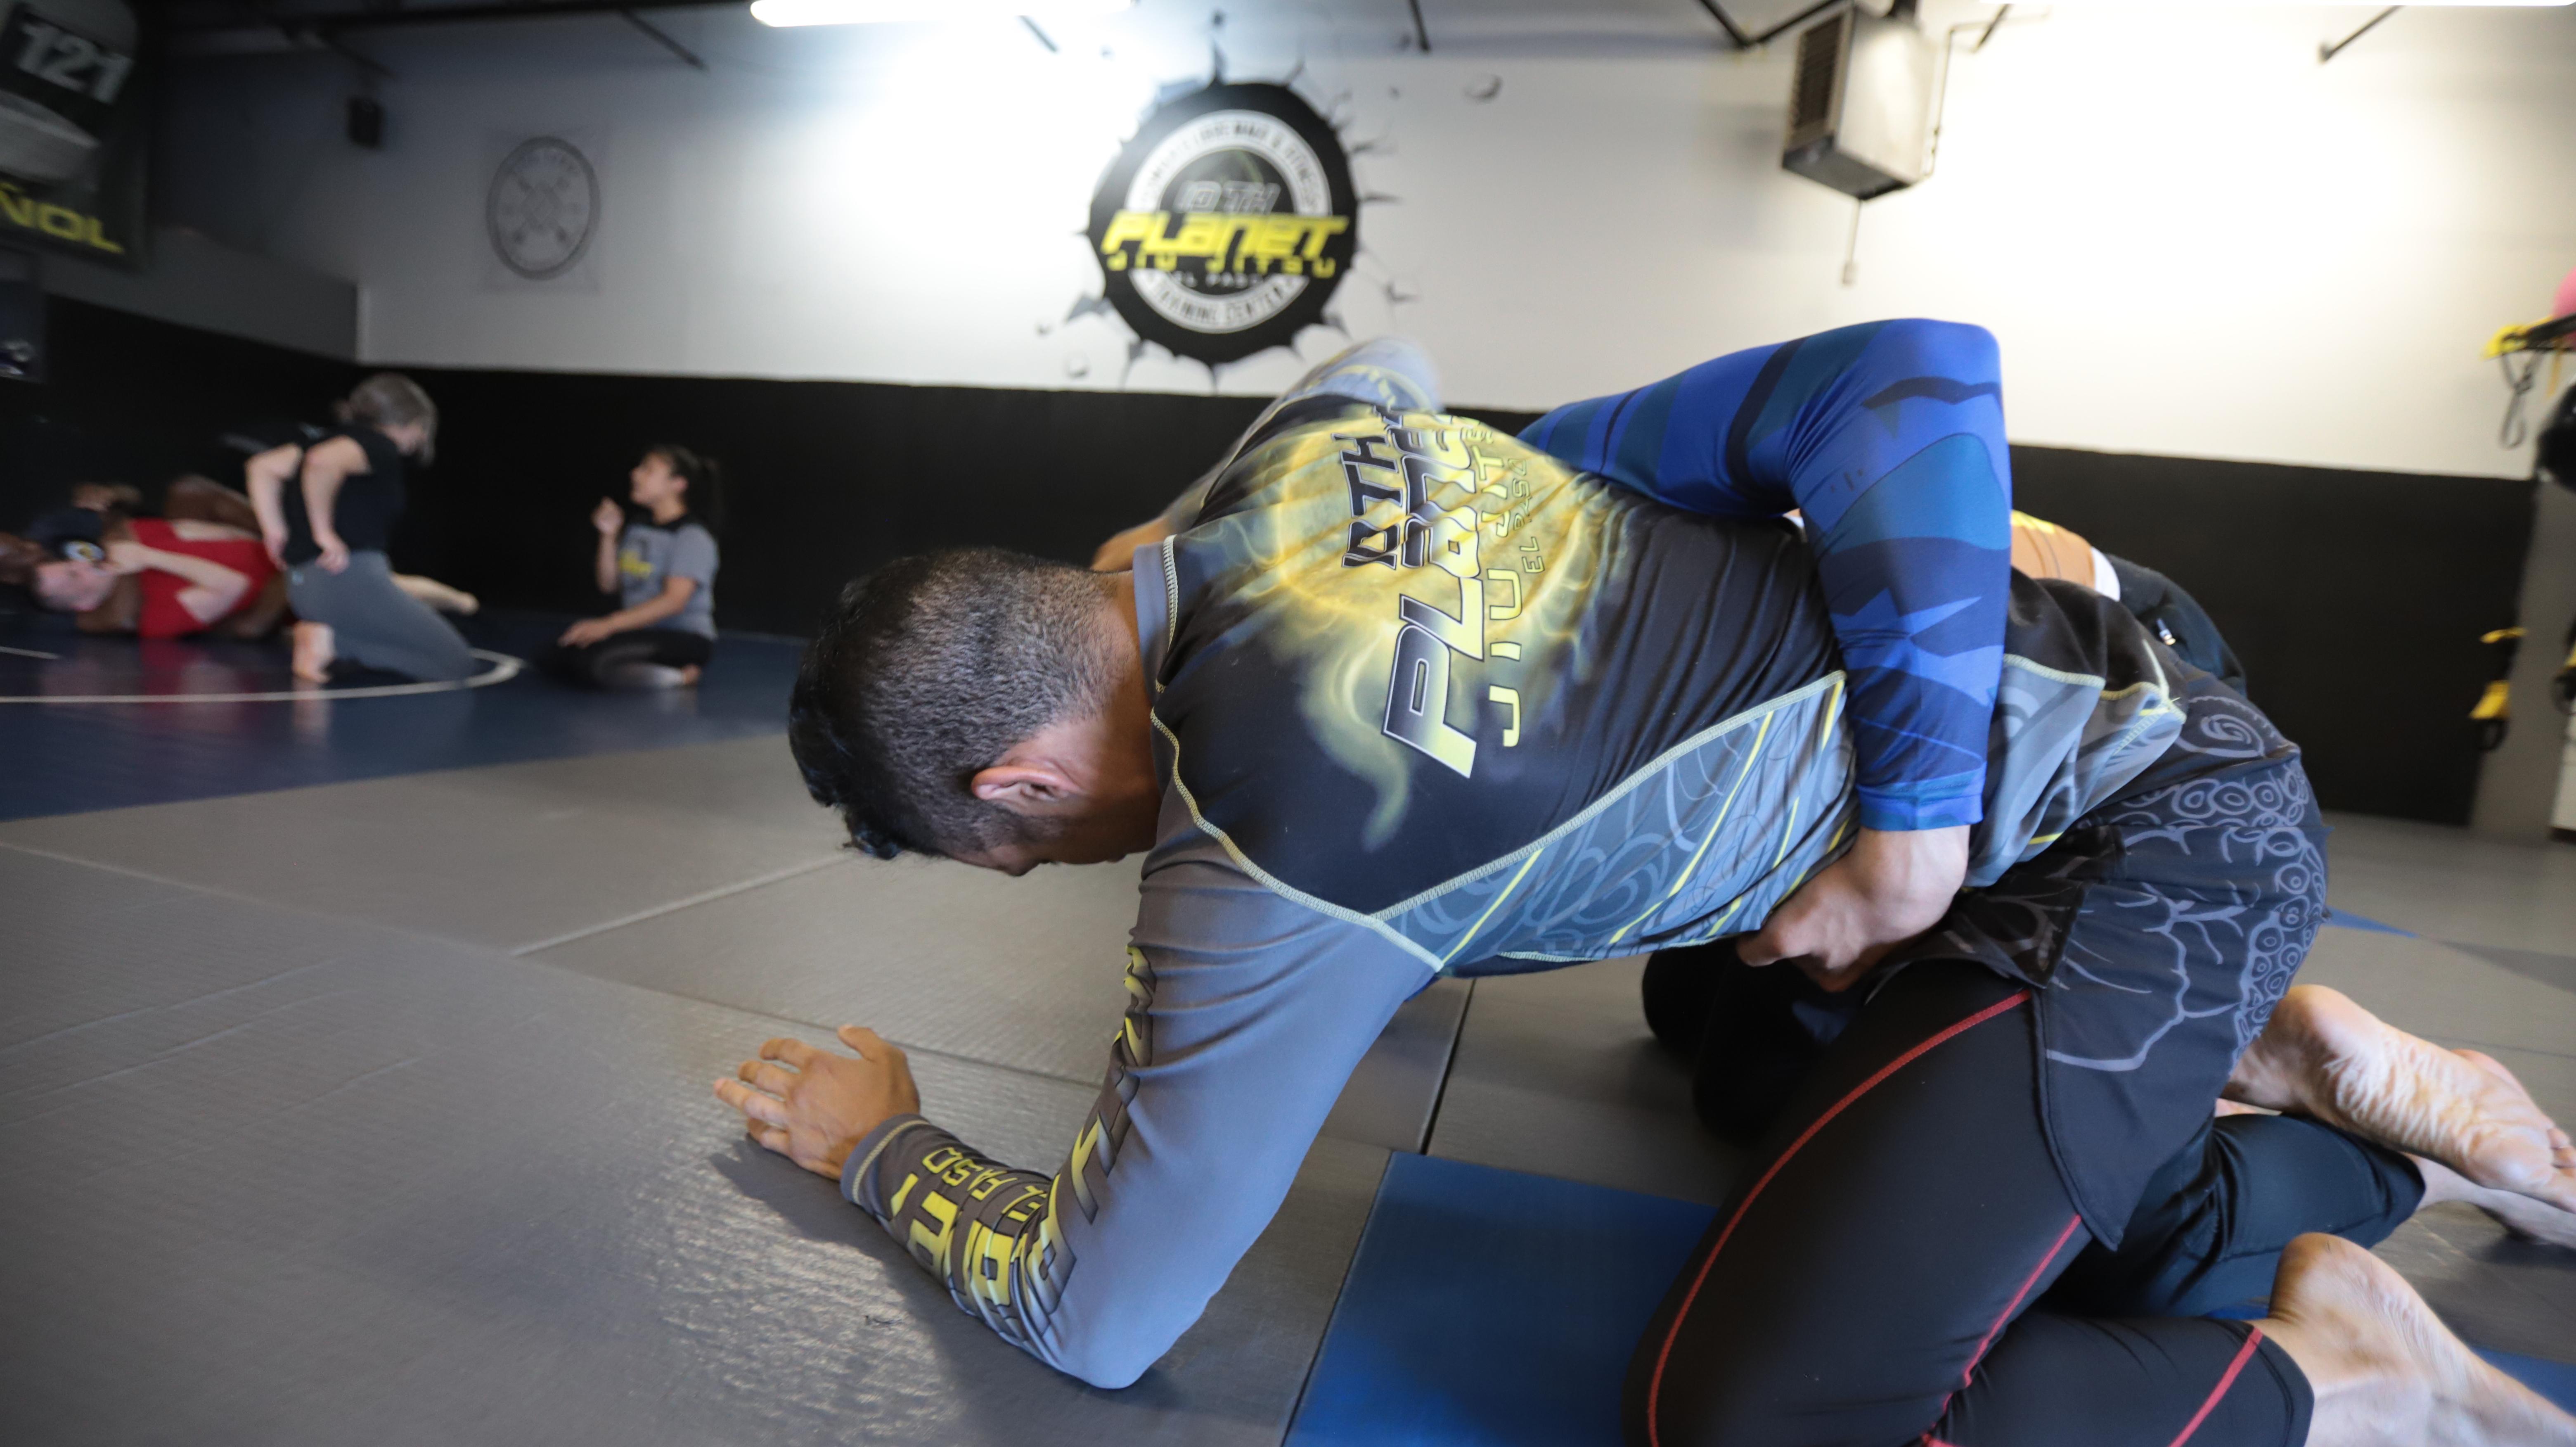 10th Planet Jiu Jitsu El Paso image 5